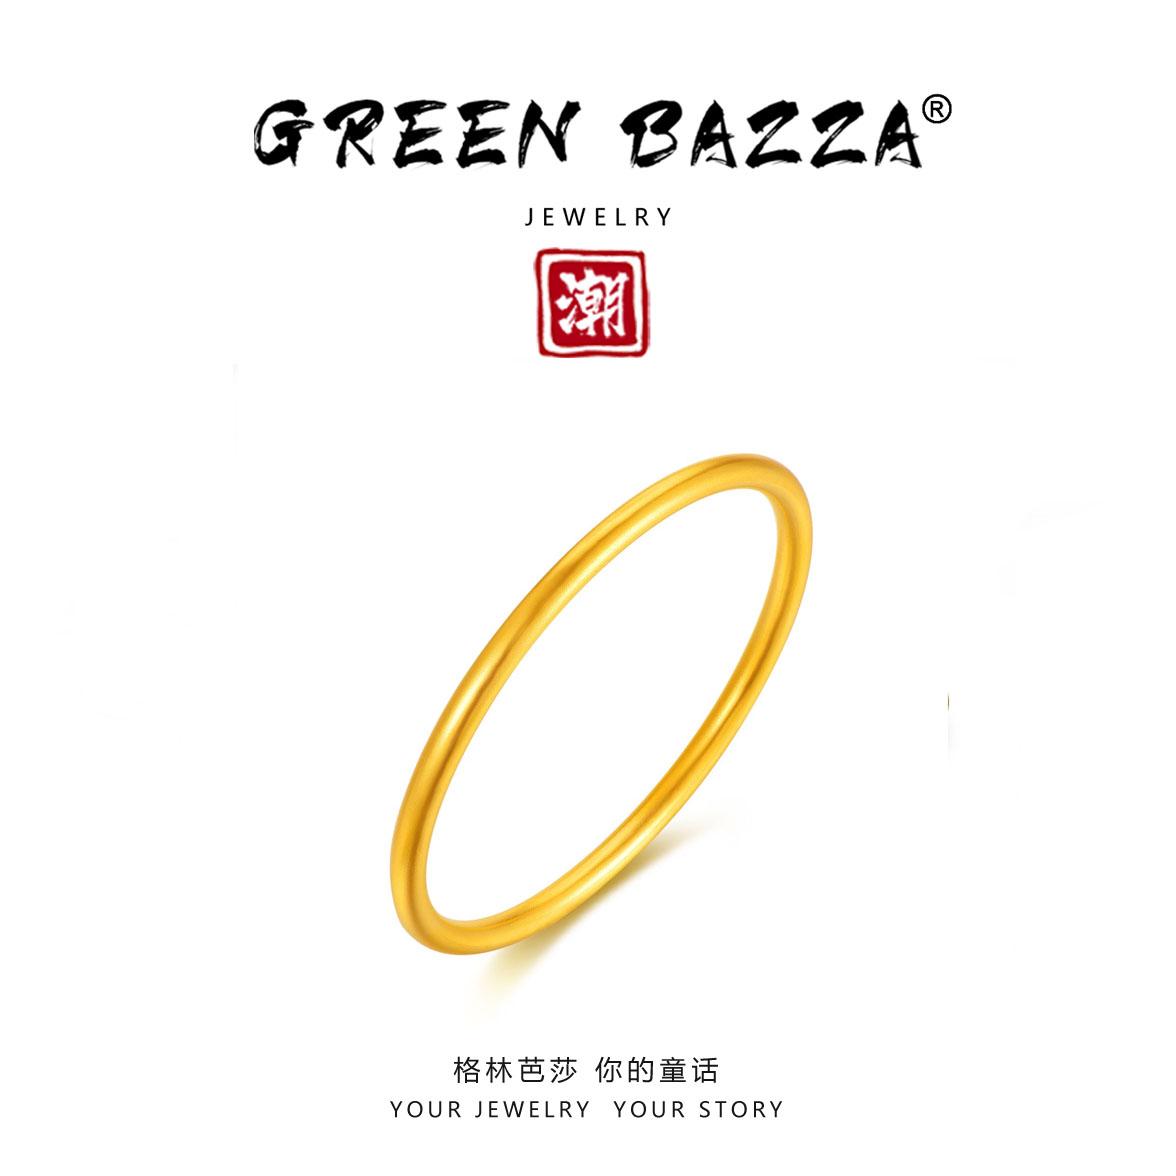 Green bazaar [inheritance. Gufa smooth Bracelet] Guochao gold 999 Gufa gold round tube smooth solid bracelet